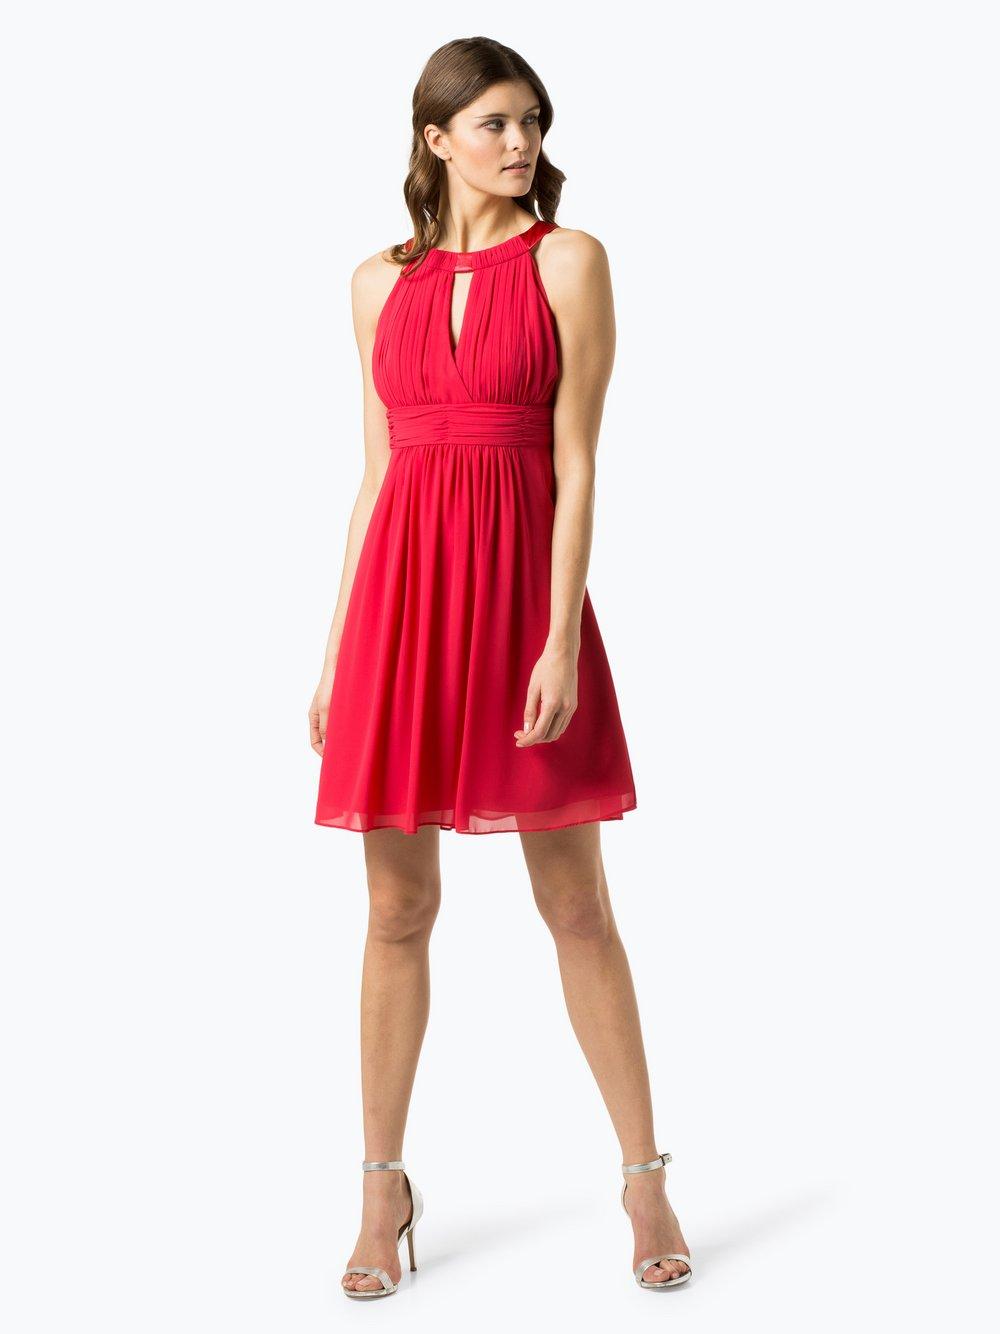 Marie Lund - Damska sukienka koktajlowa, różowy